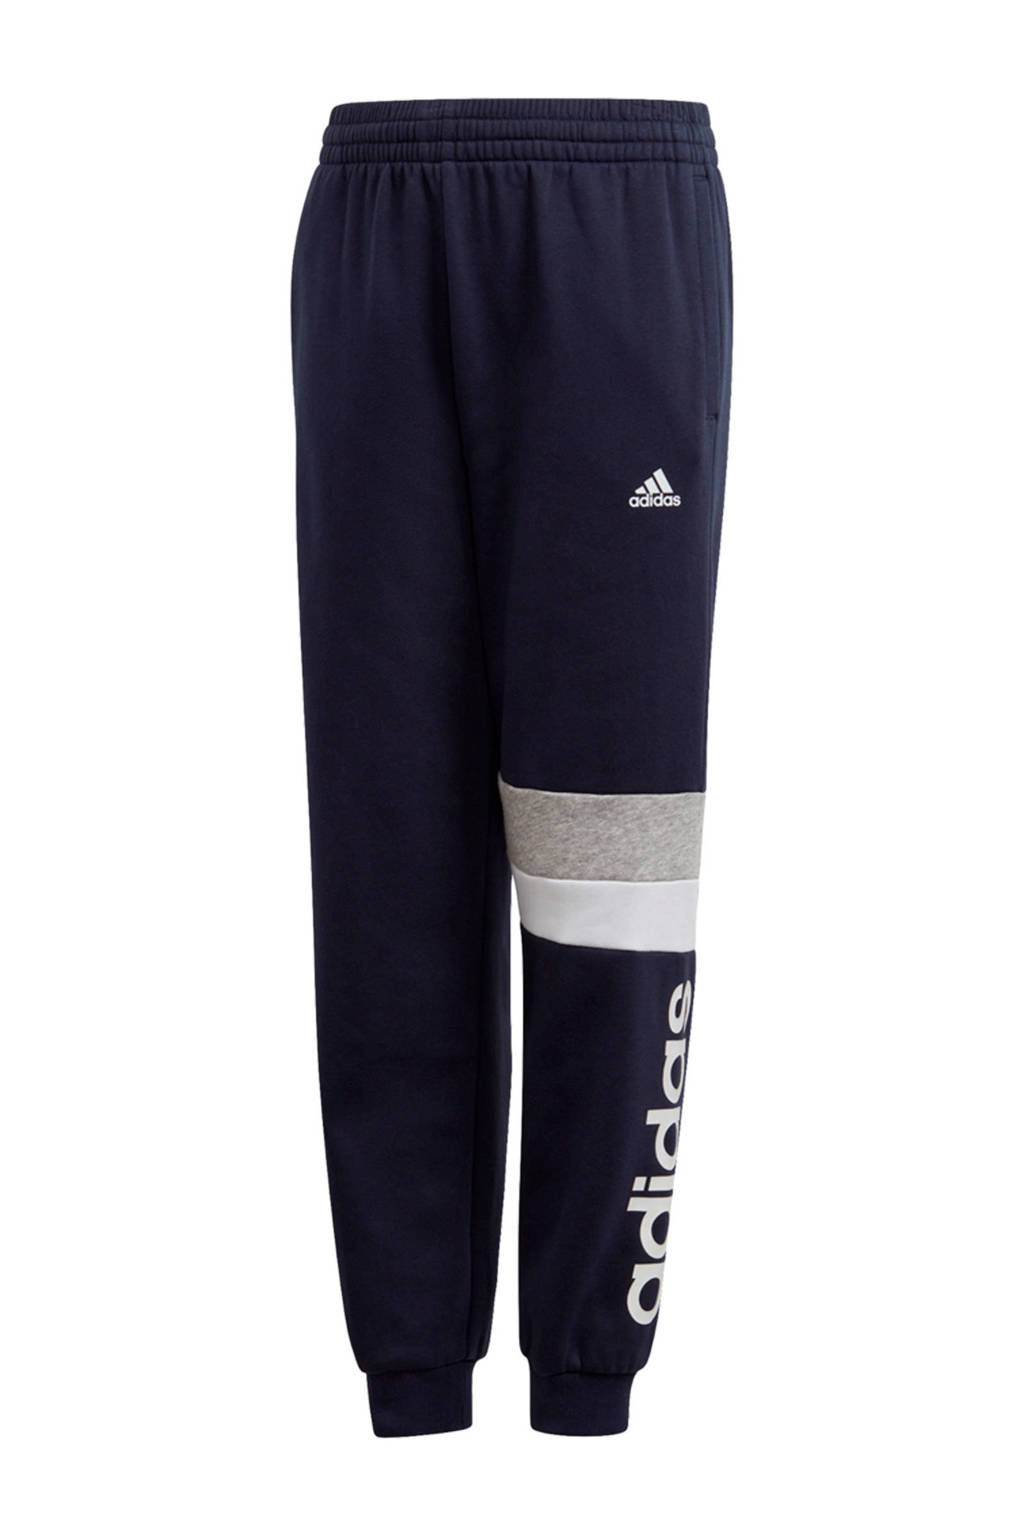 adidas Performance   sportbroek donkerblauw/wit, Donkerblauw/wit